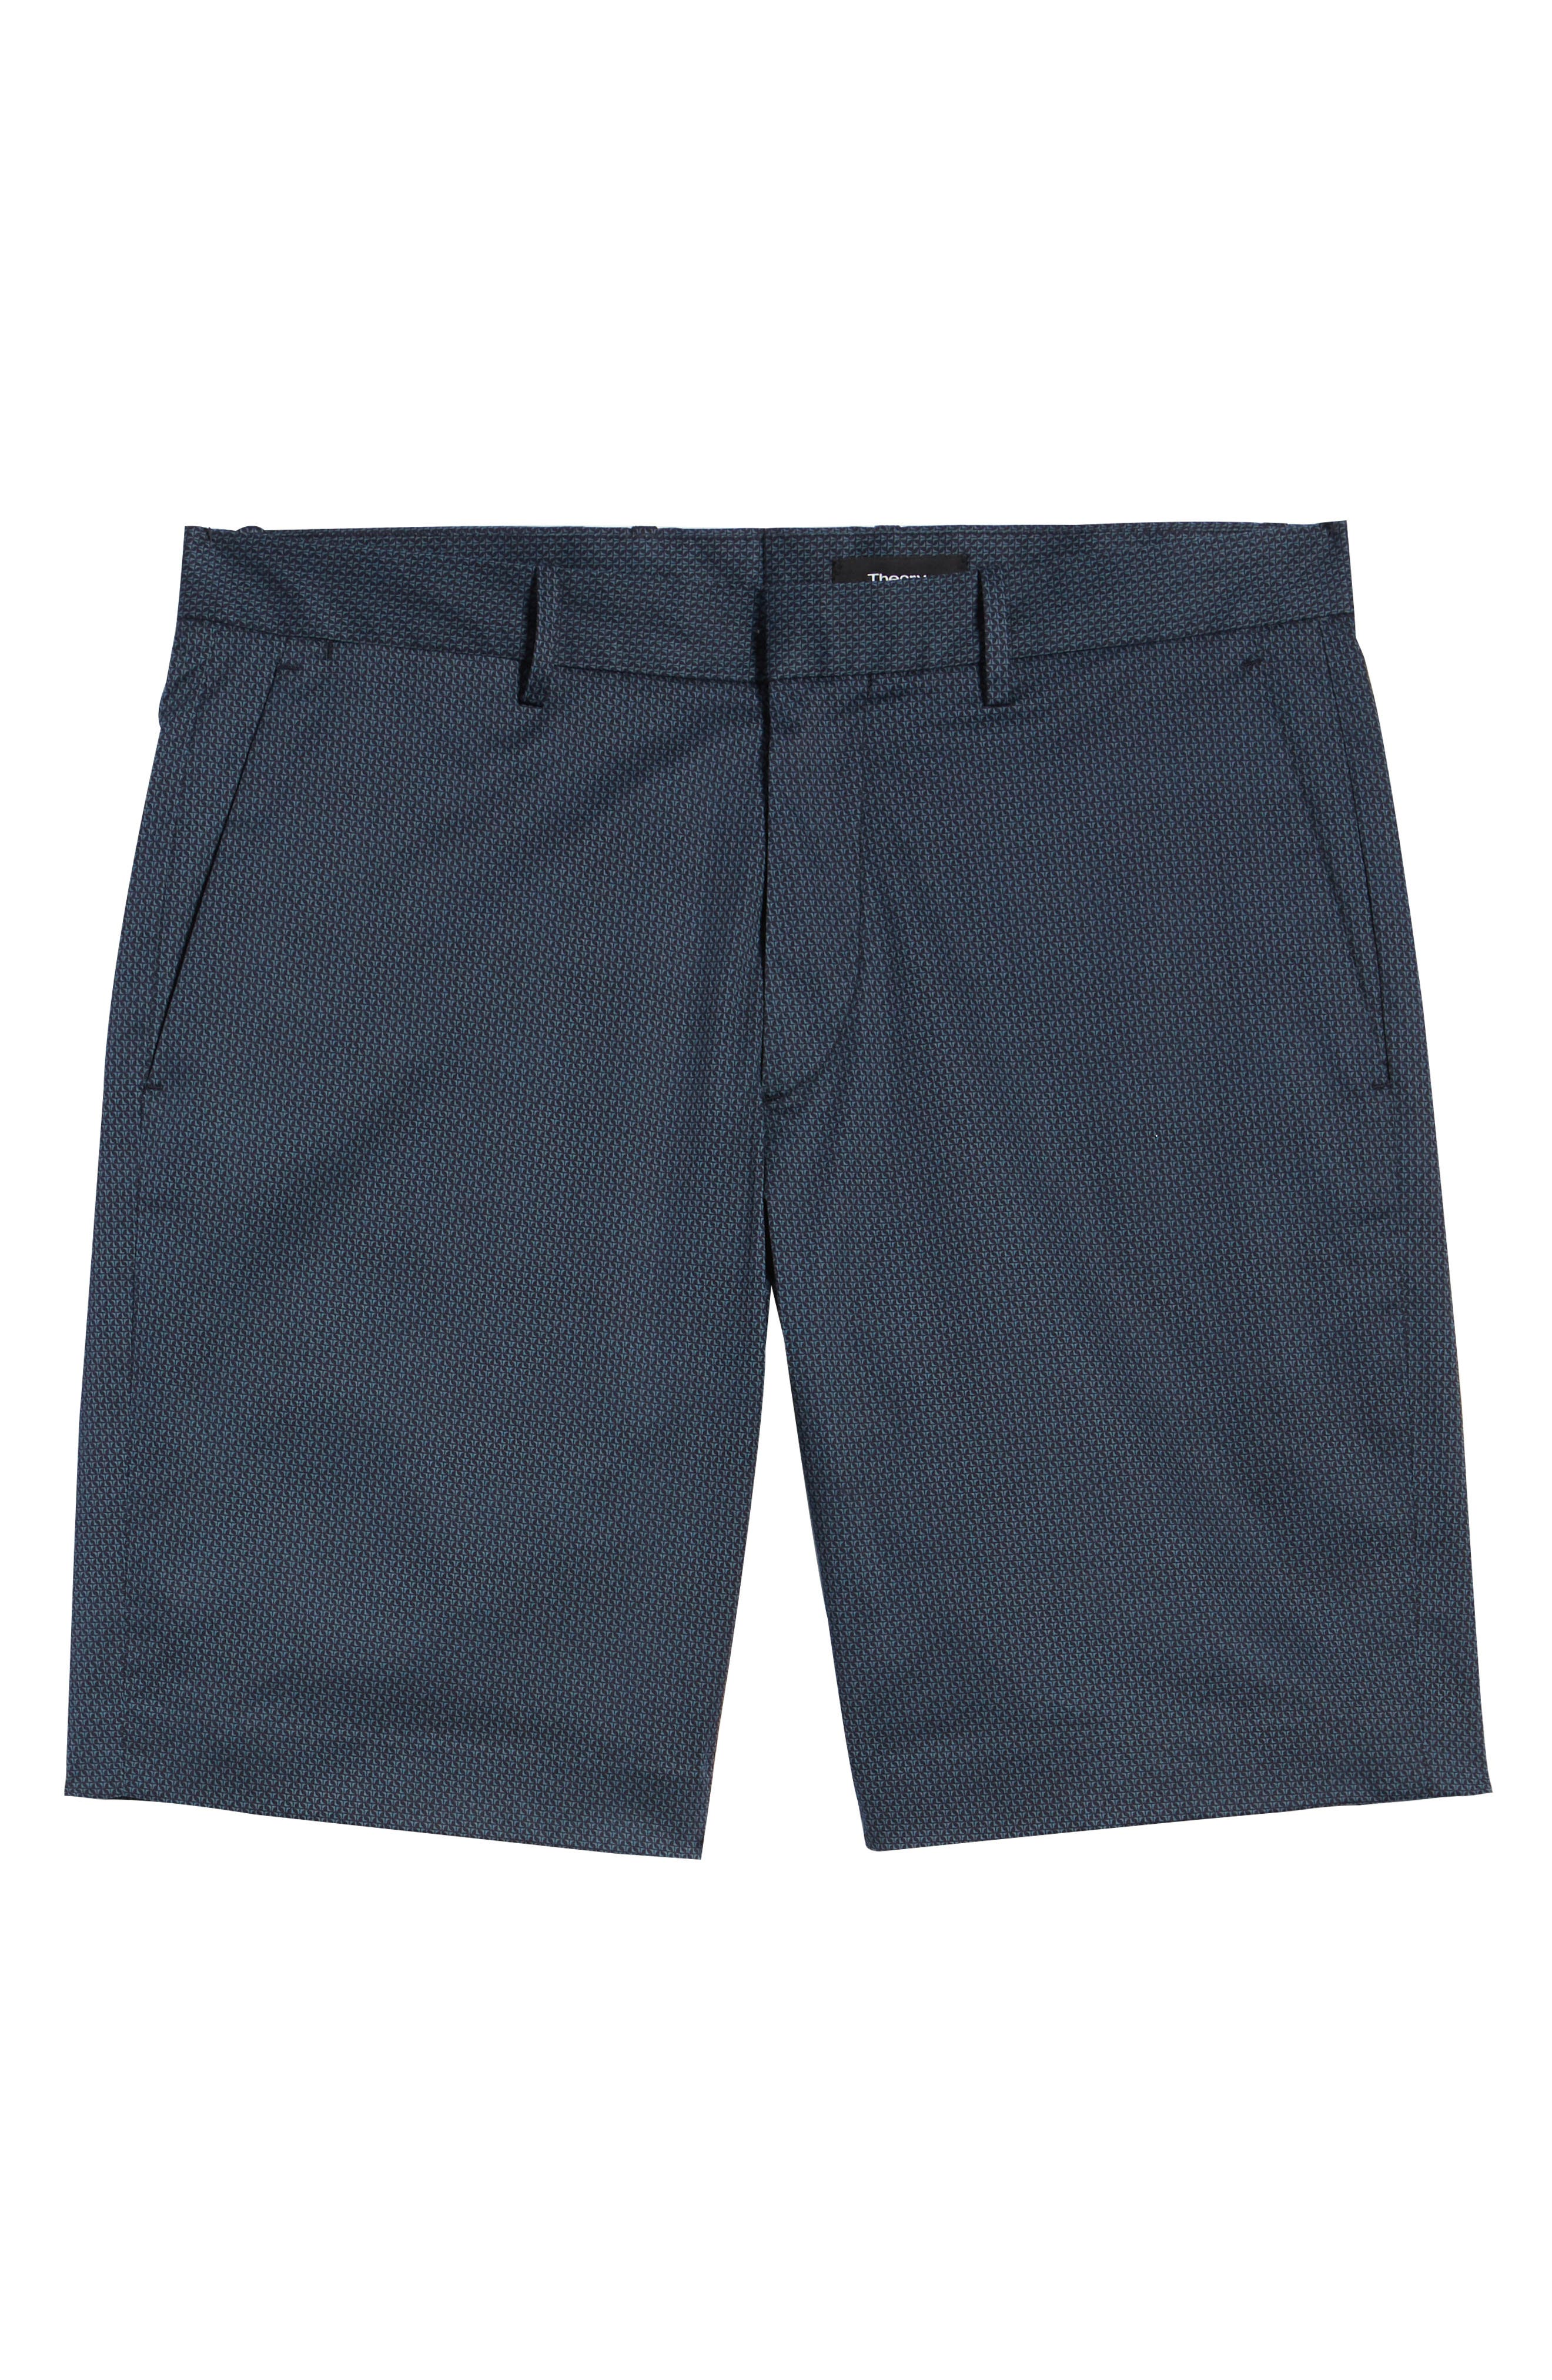 Zaine Stretch Cotton Shorts,                             Alternate thumbnail 6, color,                             ECLIPSE MULTI